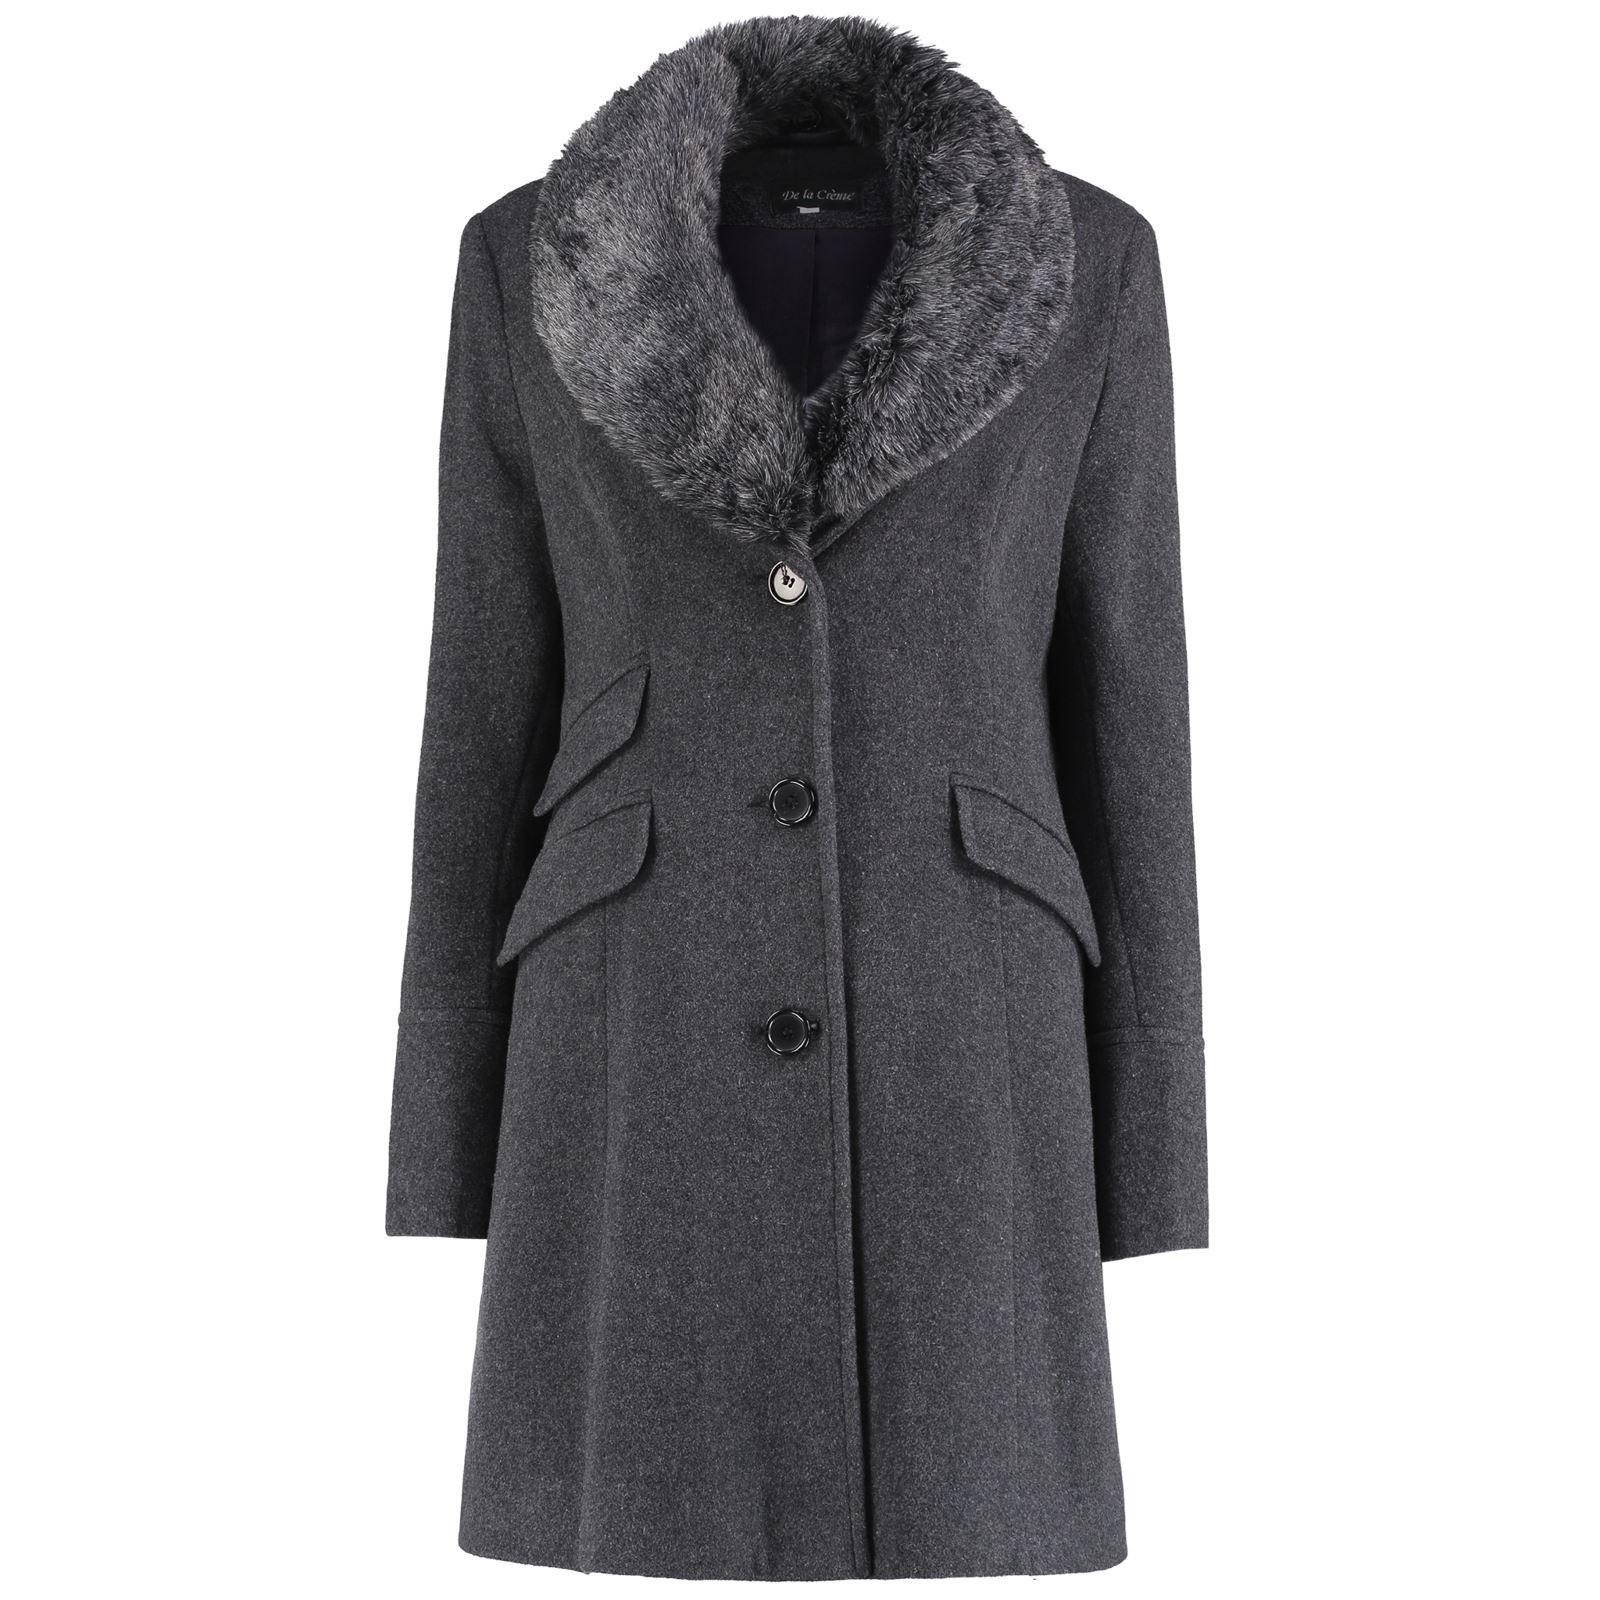 De-La-Creme-Womens-Wool-Blend-Faux-Fur-Collar-Midi-Coat thumbnail 15